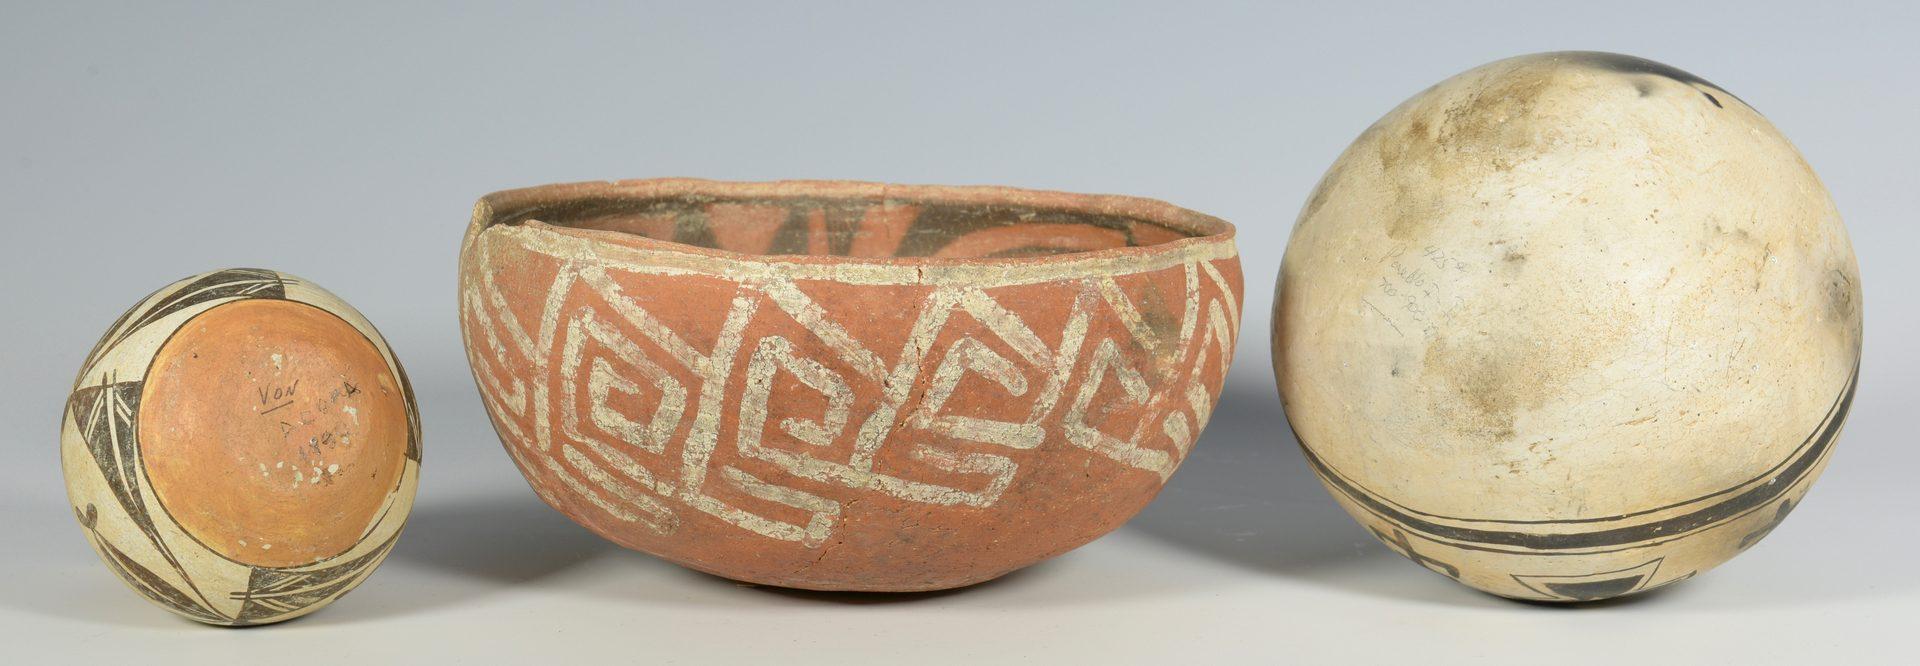 Lot 621: 3 Early Southwestern Pots inc. St. John's